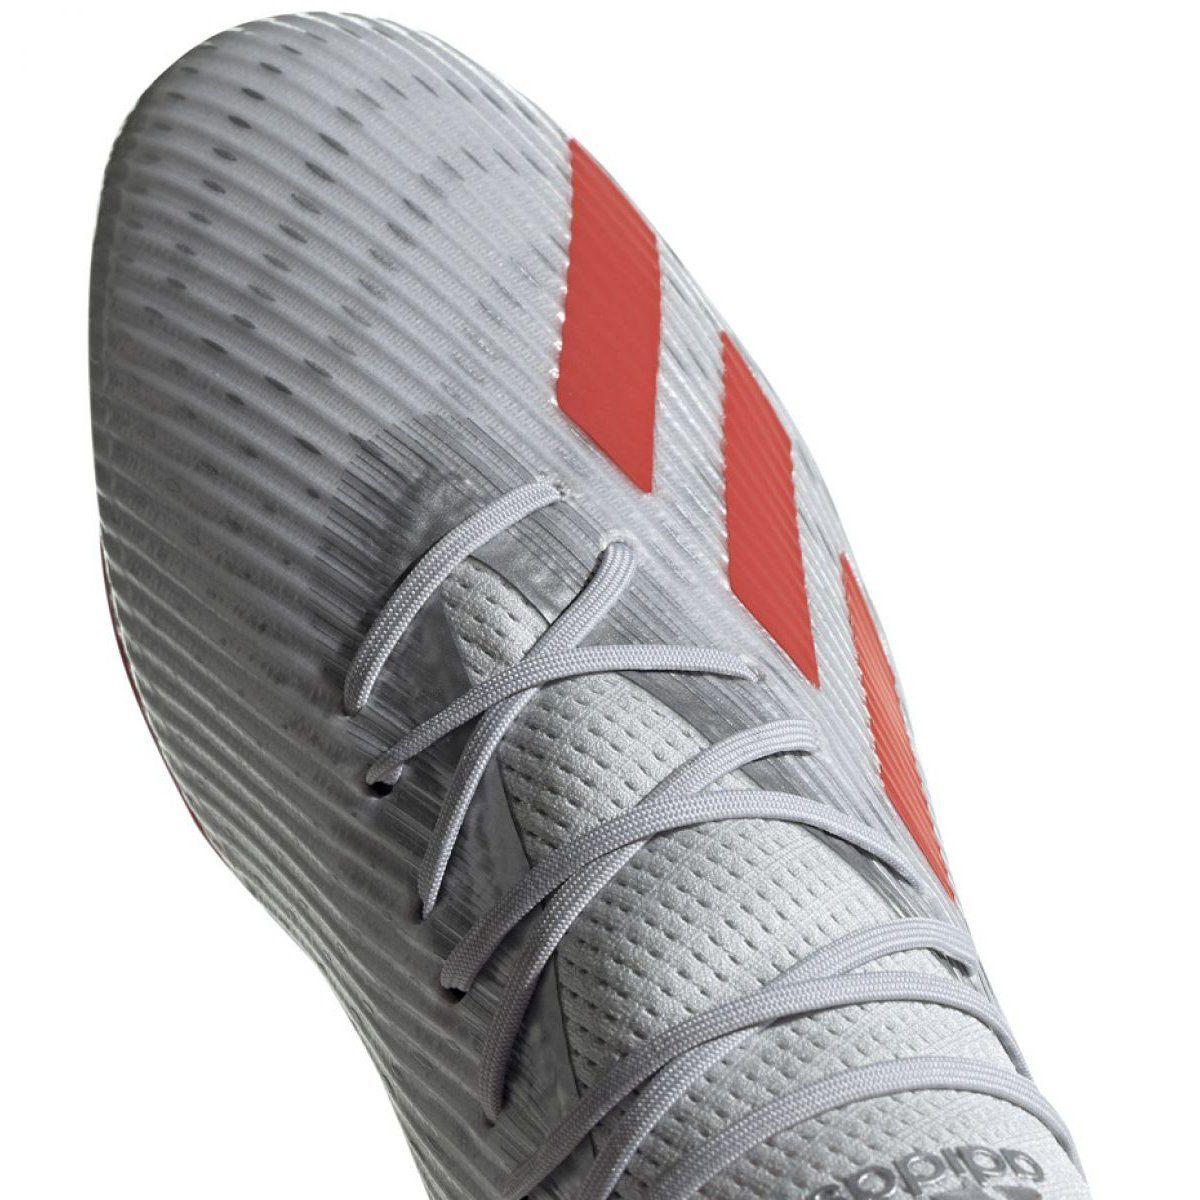 Buty Pilkarskie Adidas X 19 2 Fg M F35386 Szare Szare Football Shoes Mens Football Boots Adidas Shoes